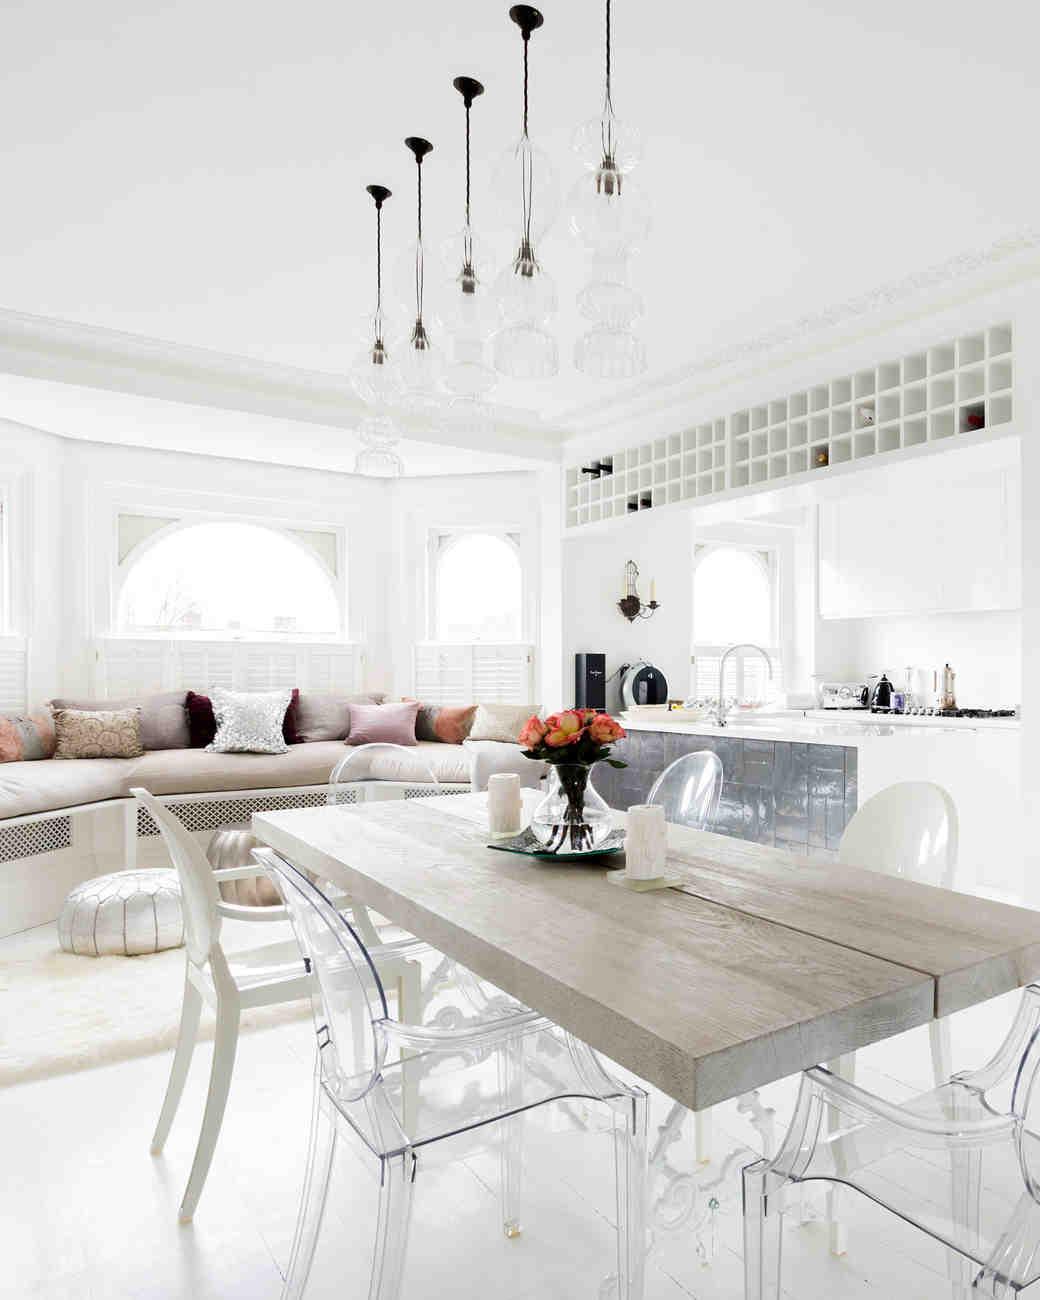 villa-rentals-london-one-fine-stay-powis-square-0316.jpg